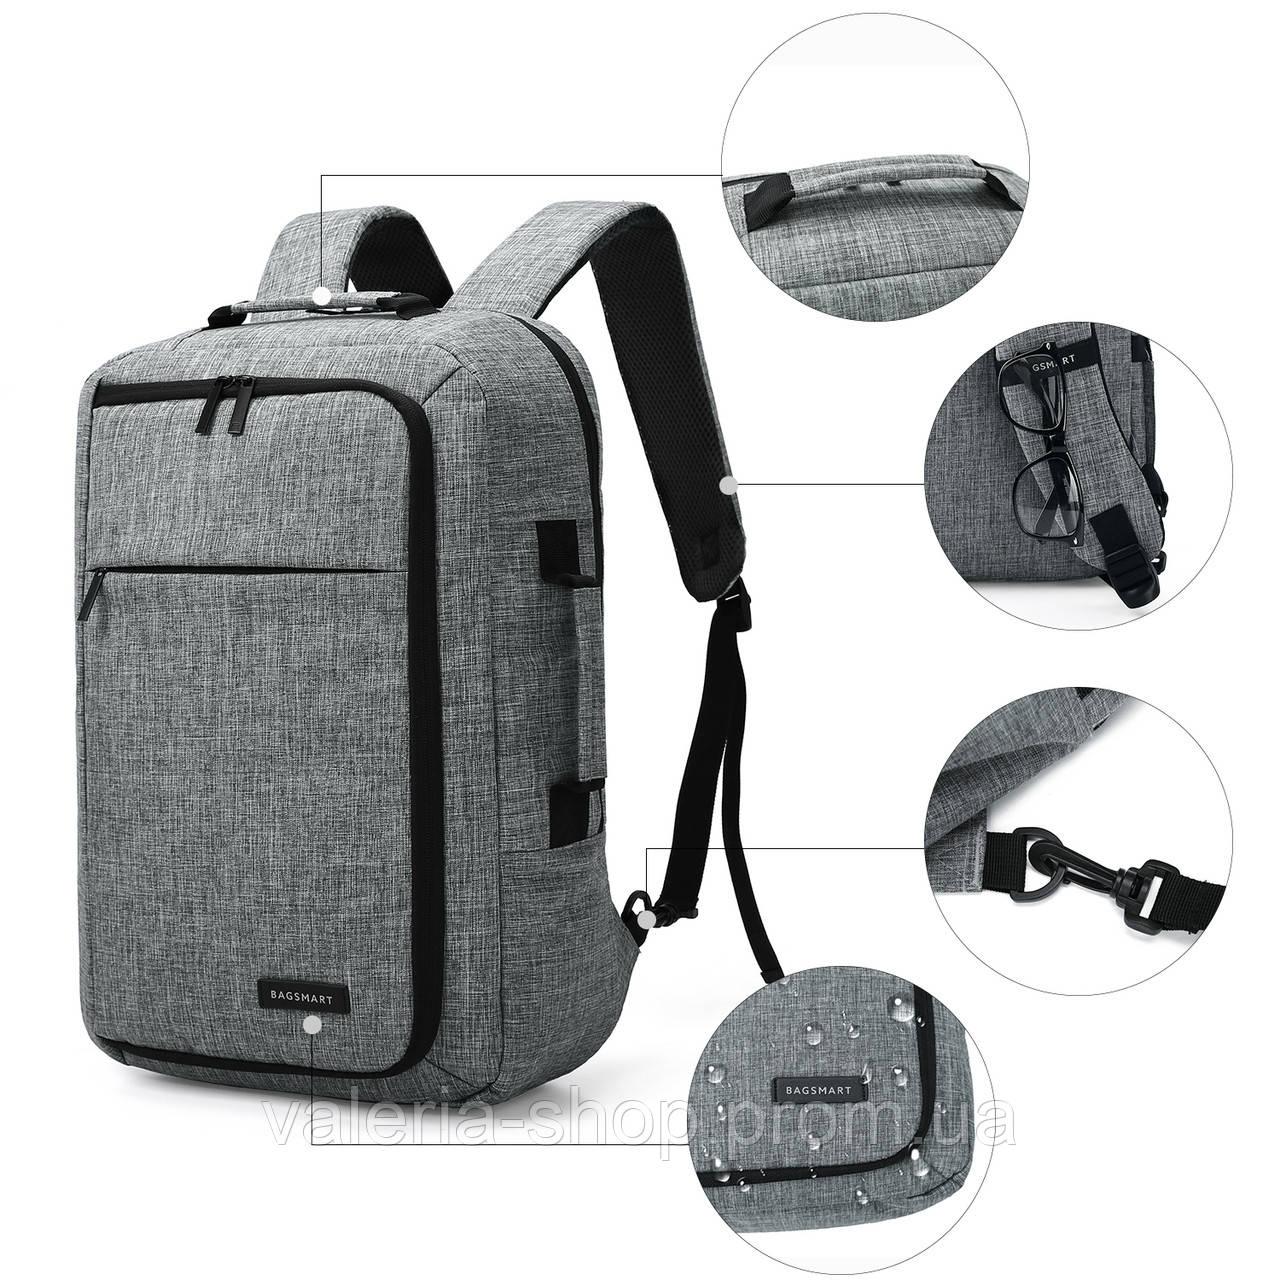 Рюкзак для ноутбука 15.6″ Pomona Bagsmart серый